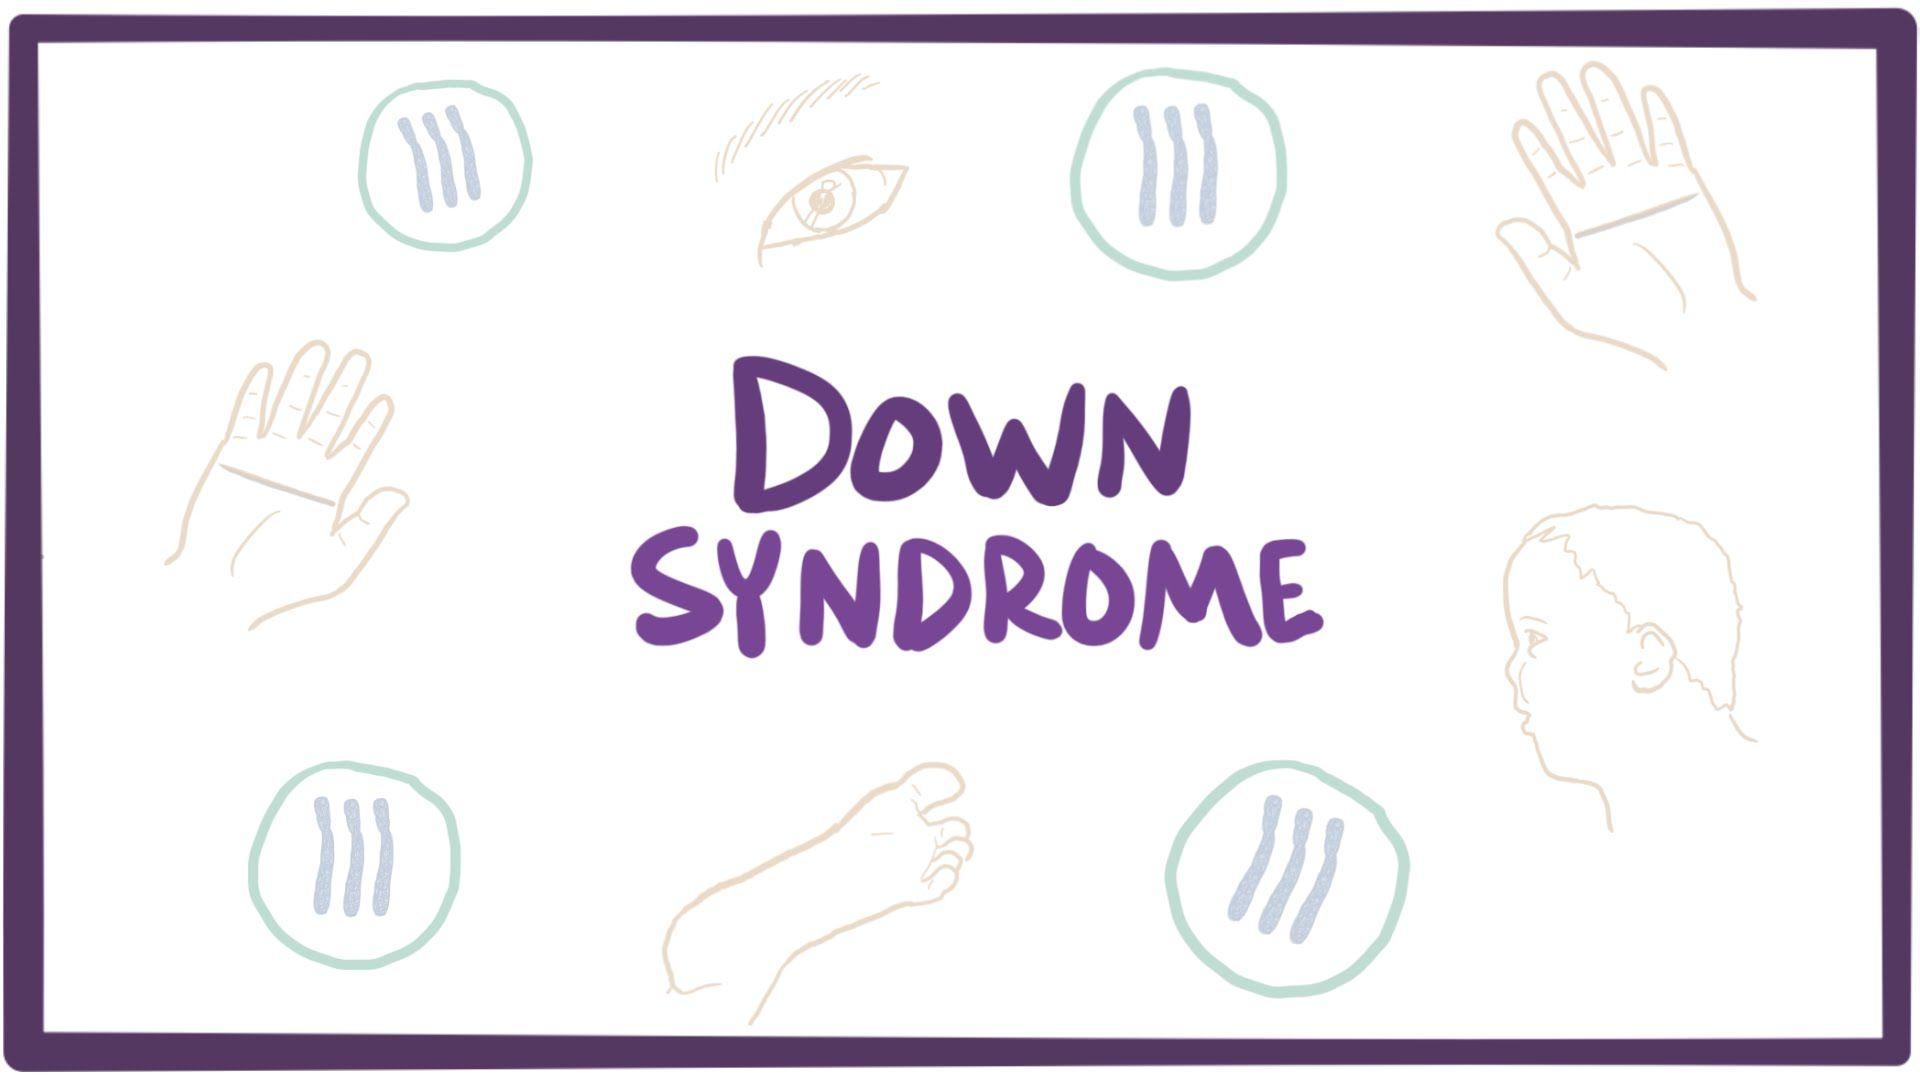 Down Syndrome Trisomy 21 Causes Symptoms Diagnosis